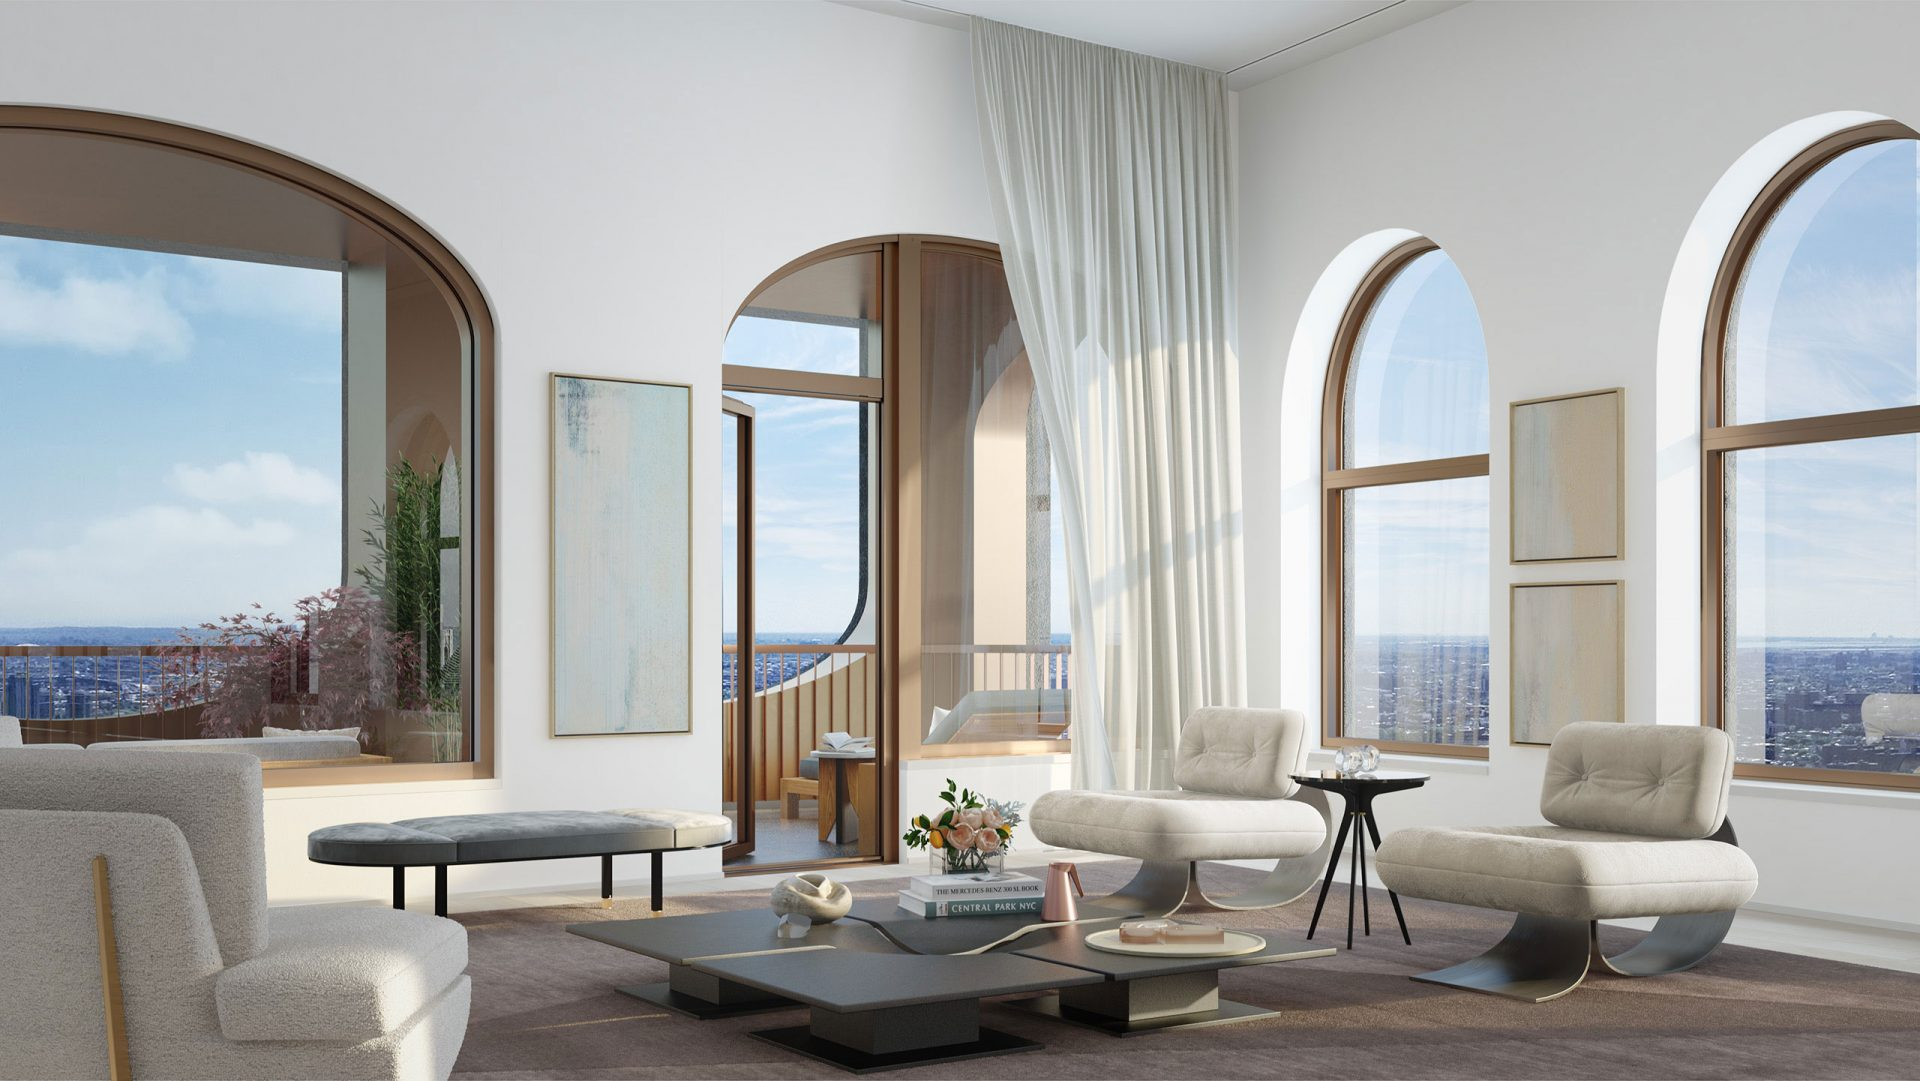 130William_03_Residences_09_INT_Living_Loggia_2560pxl-1920x1081.jpg